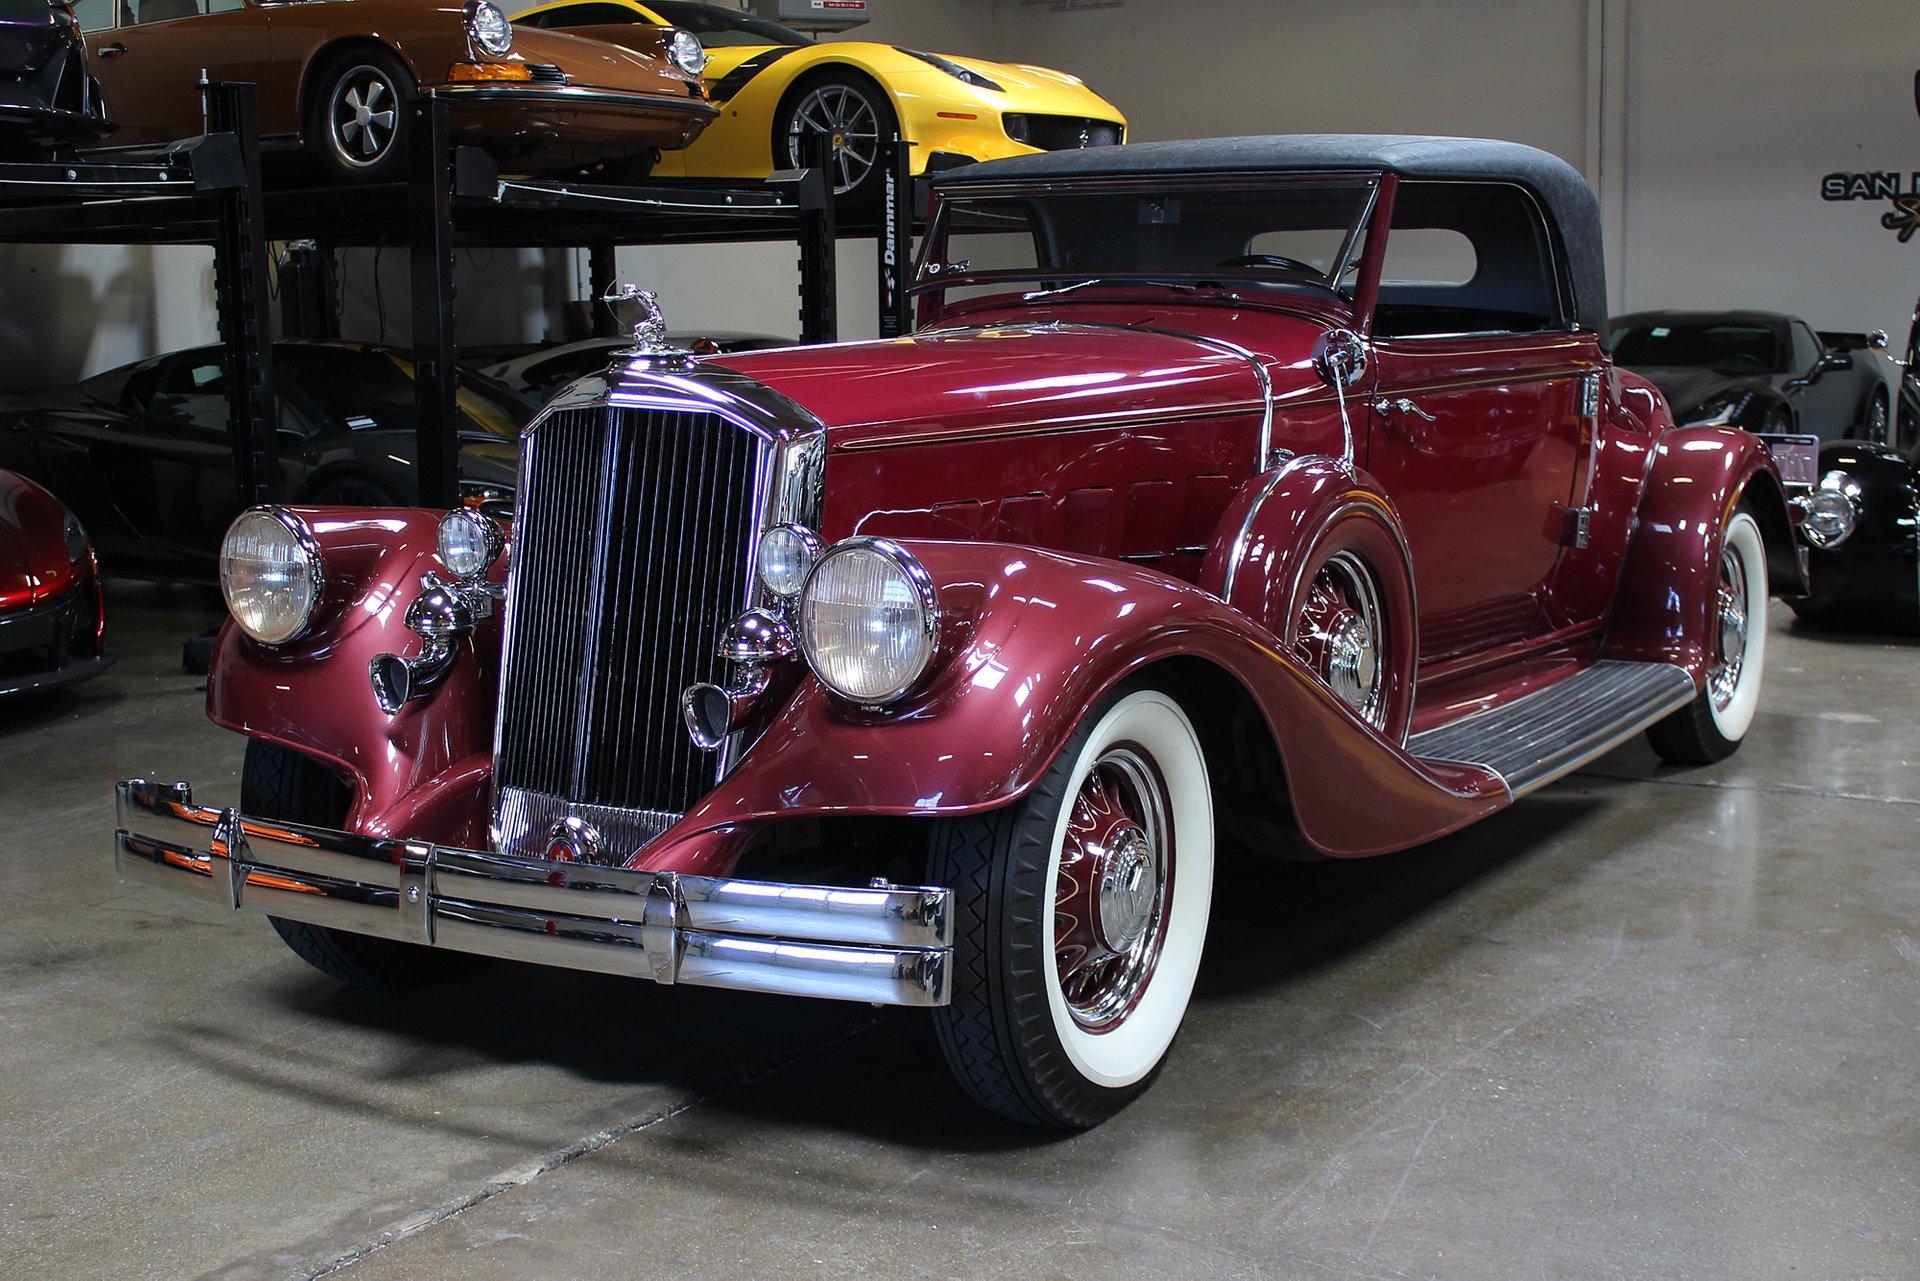 ... 1933 Pierce Arrow 836 Rumble Seat Coupe ...